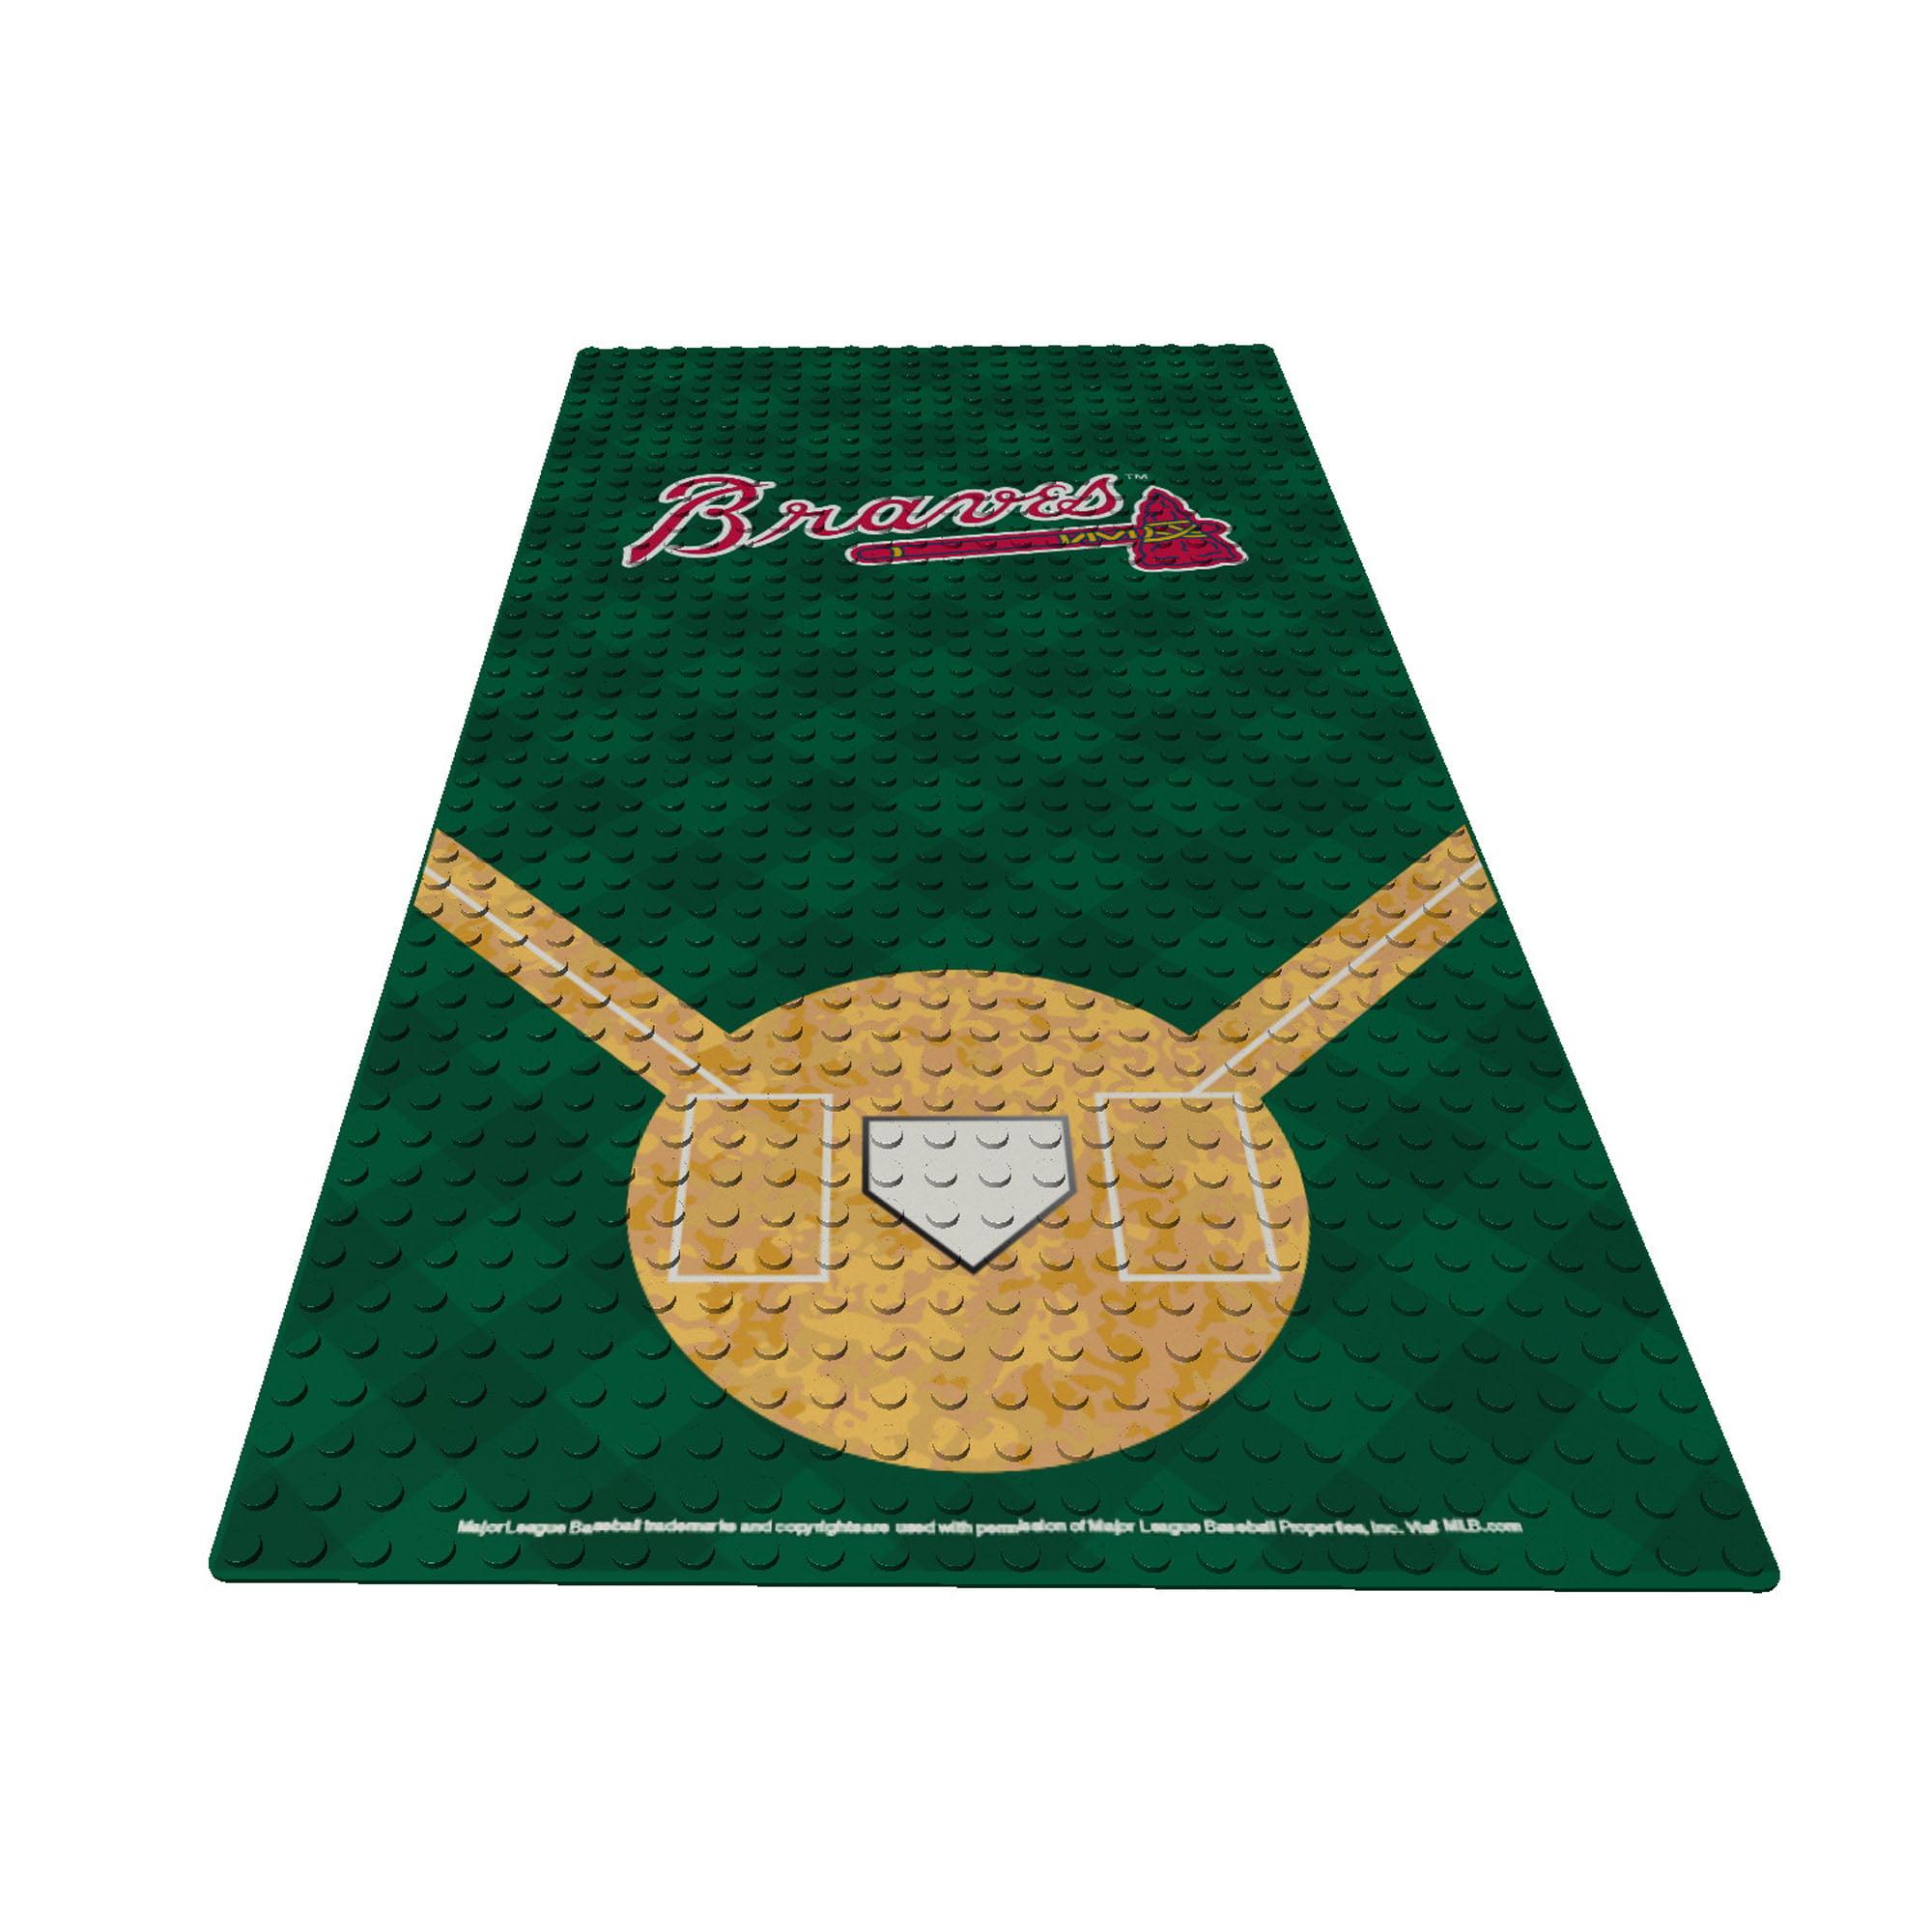 Atlanta Braves OYO Sports Display Plate - No Size